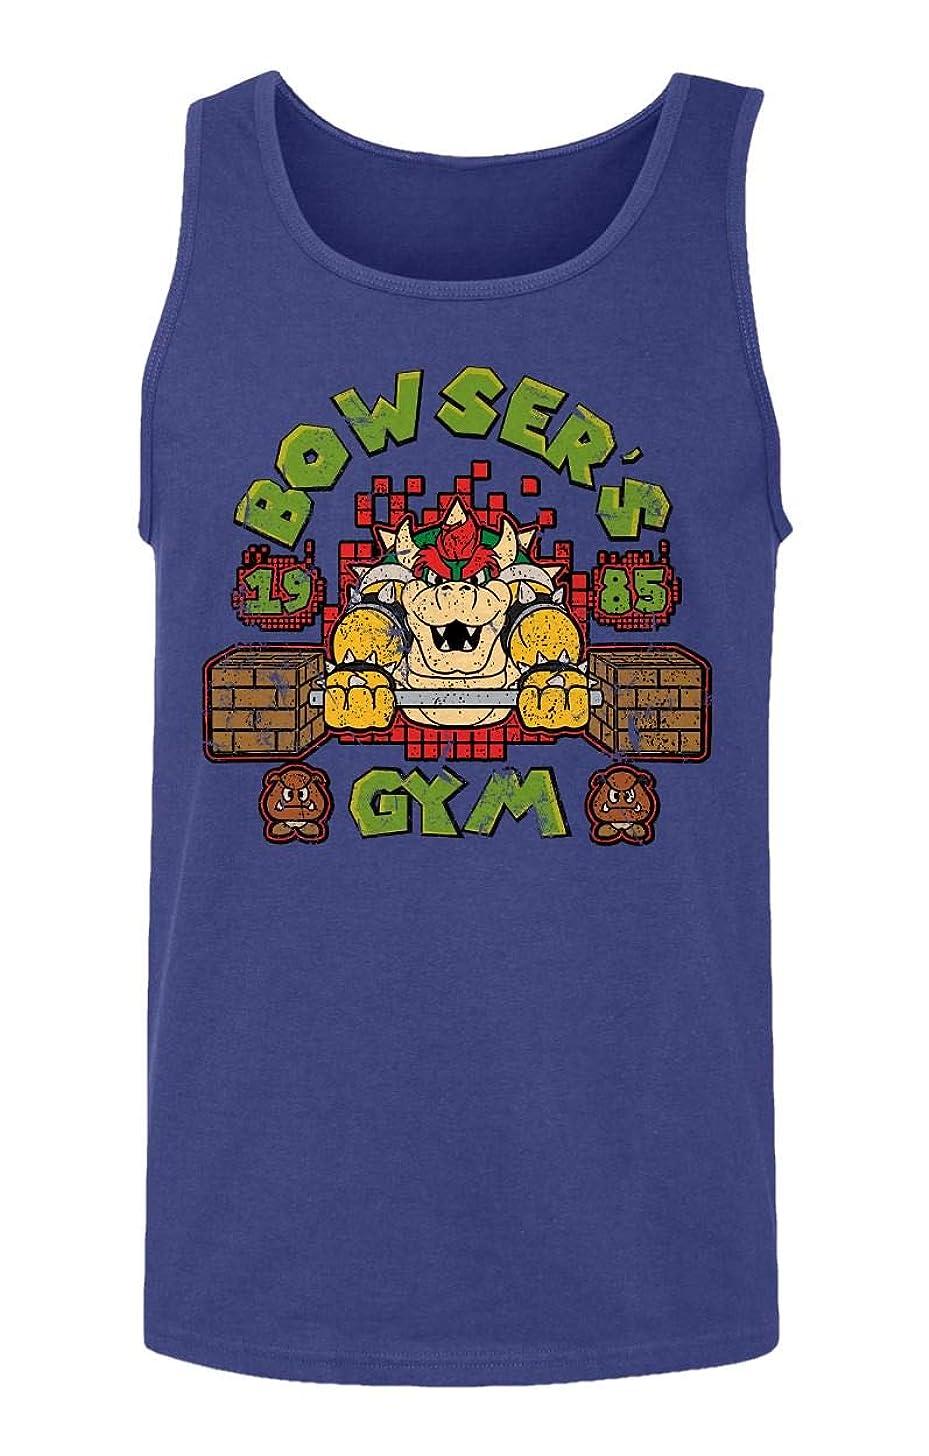 RIVEBELLA New Graphic Mario Novelty Tee Bowsers Gym Men's Tank Top